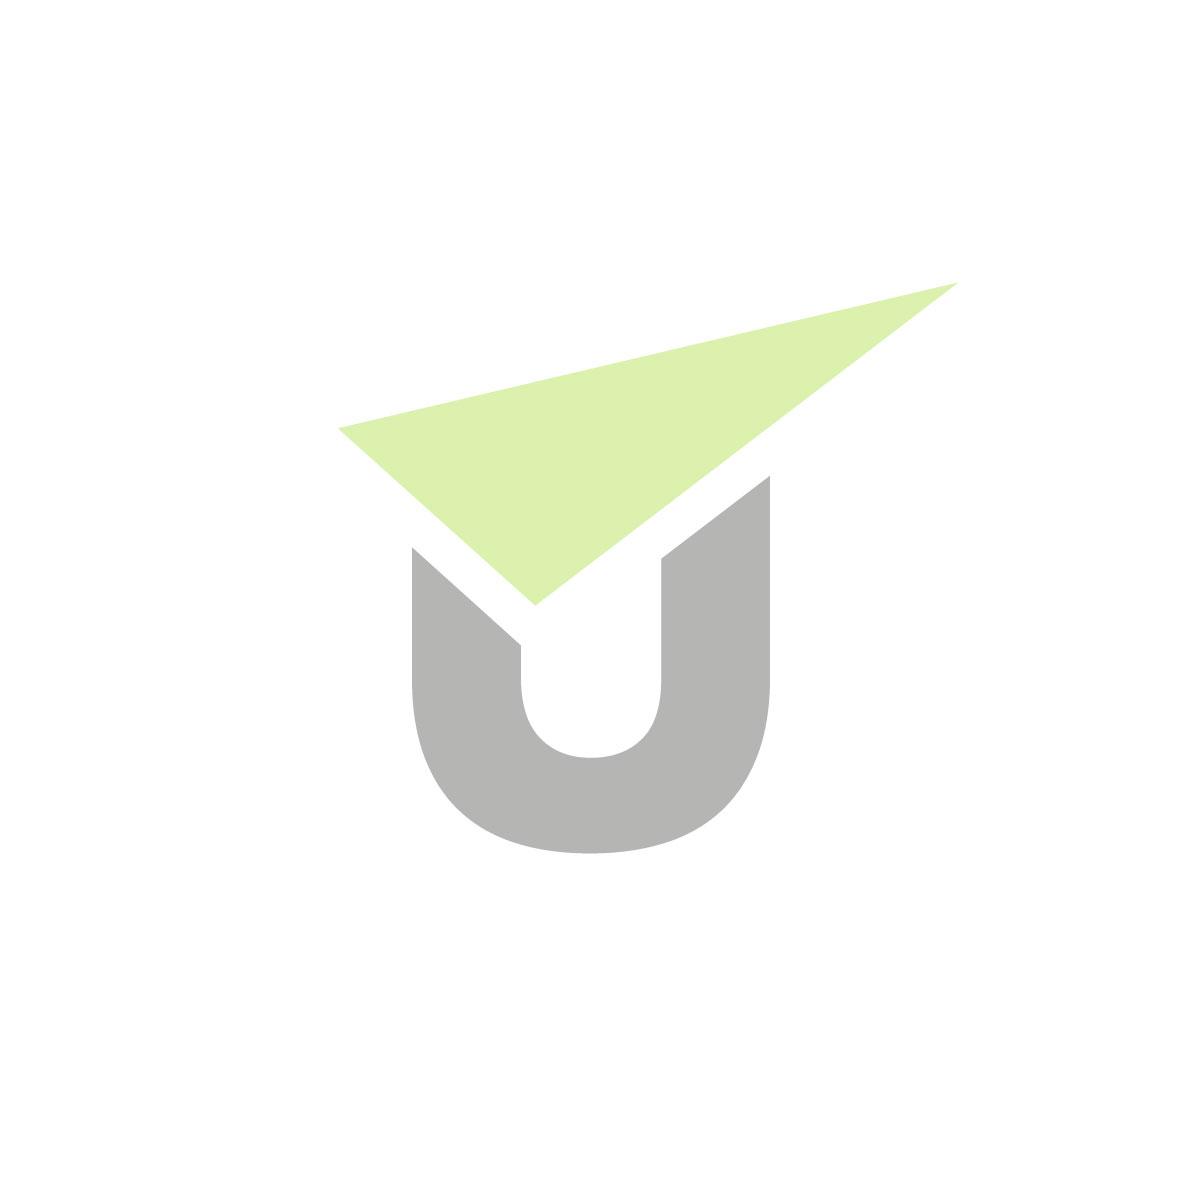 GLM770X como producto recomendado